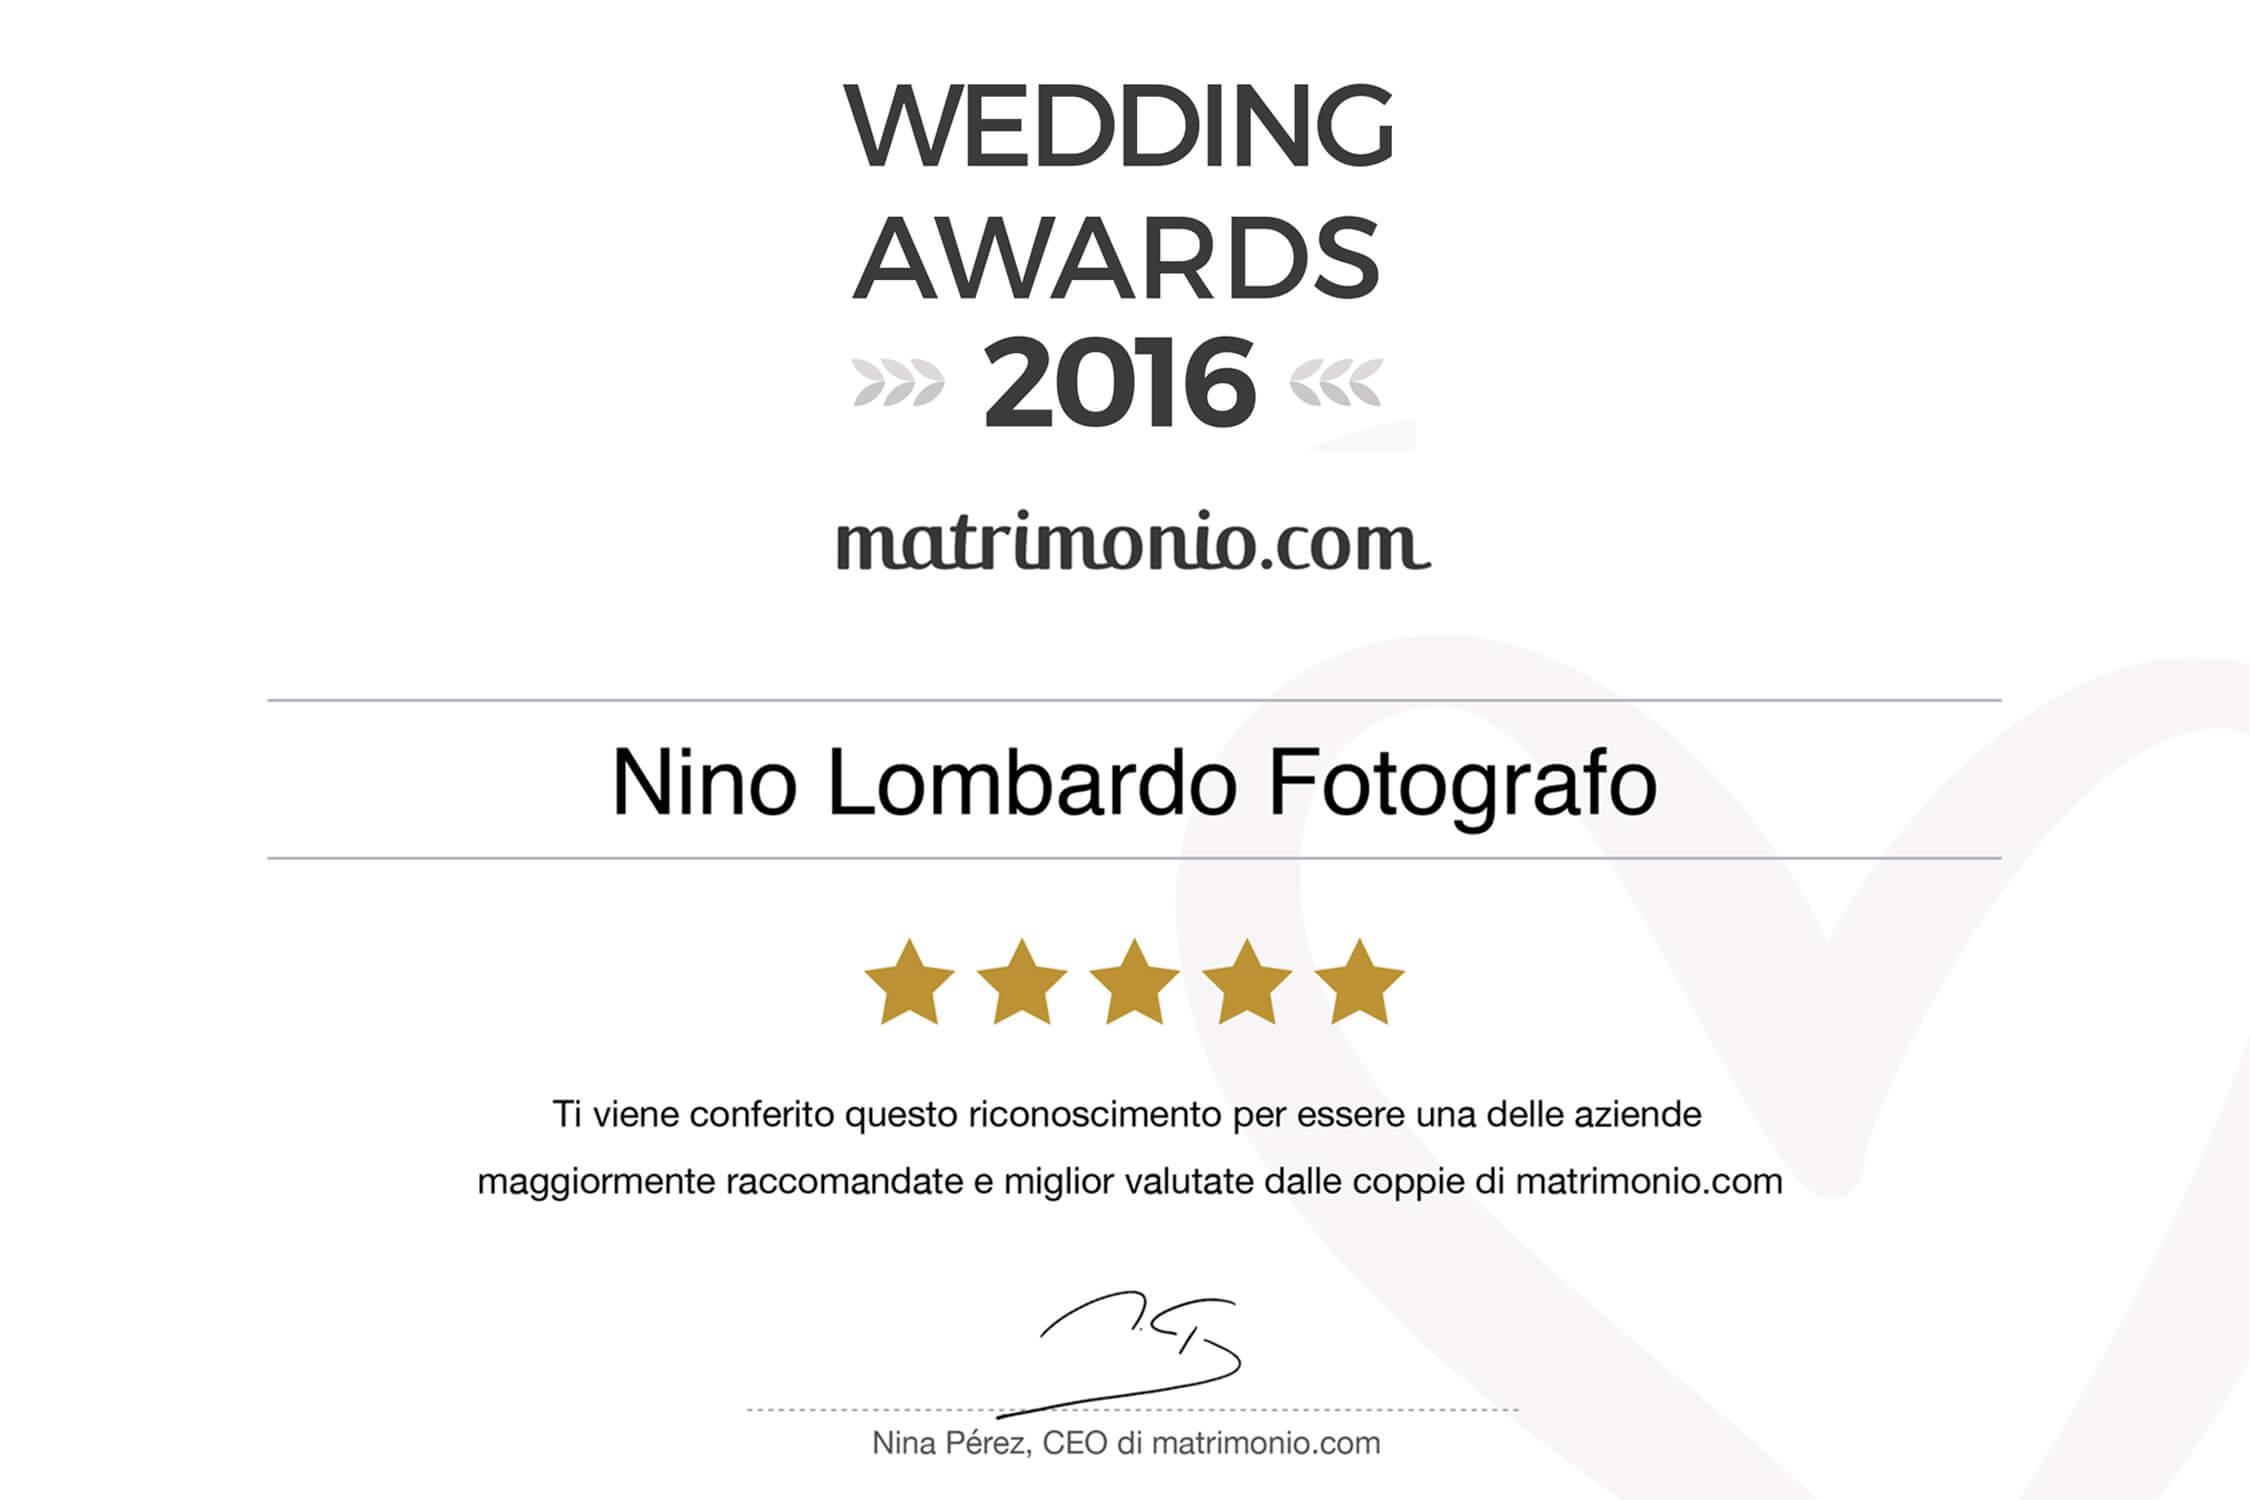 WEDDING AWARD